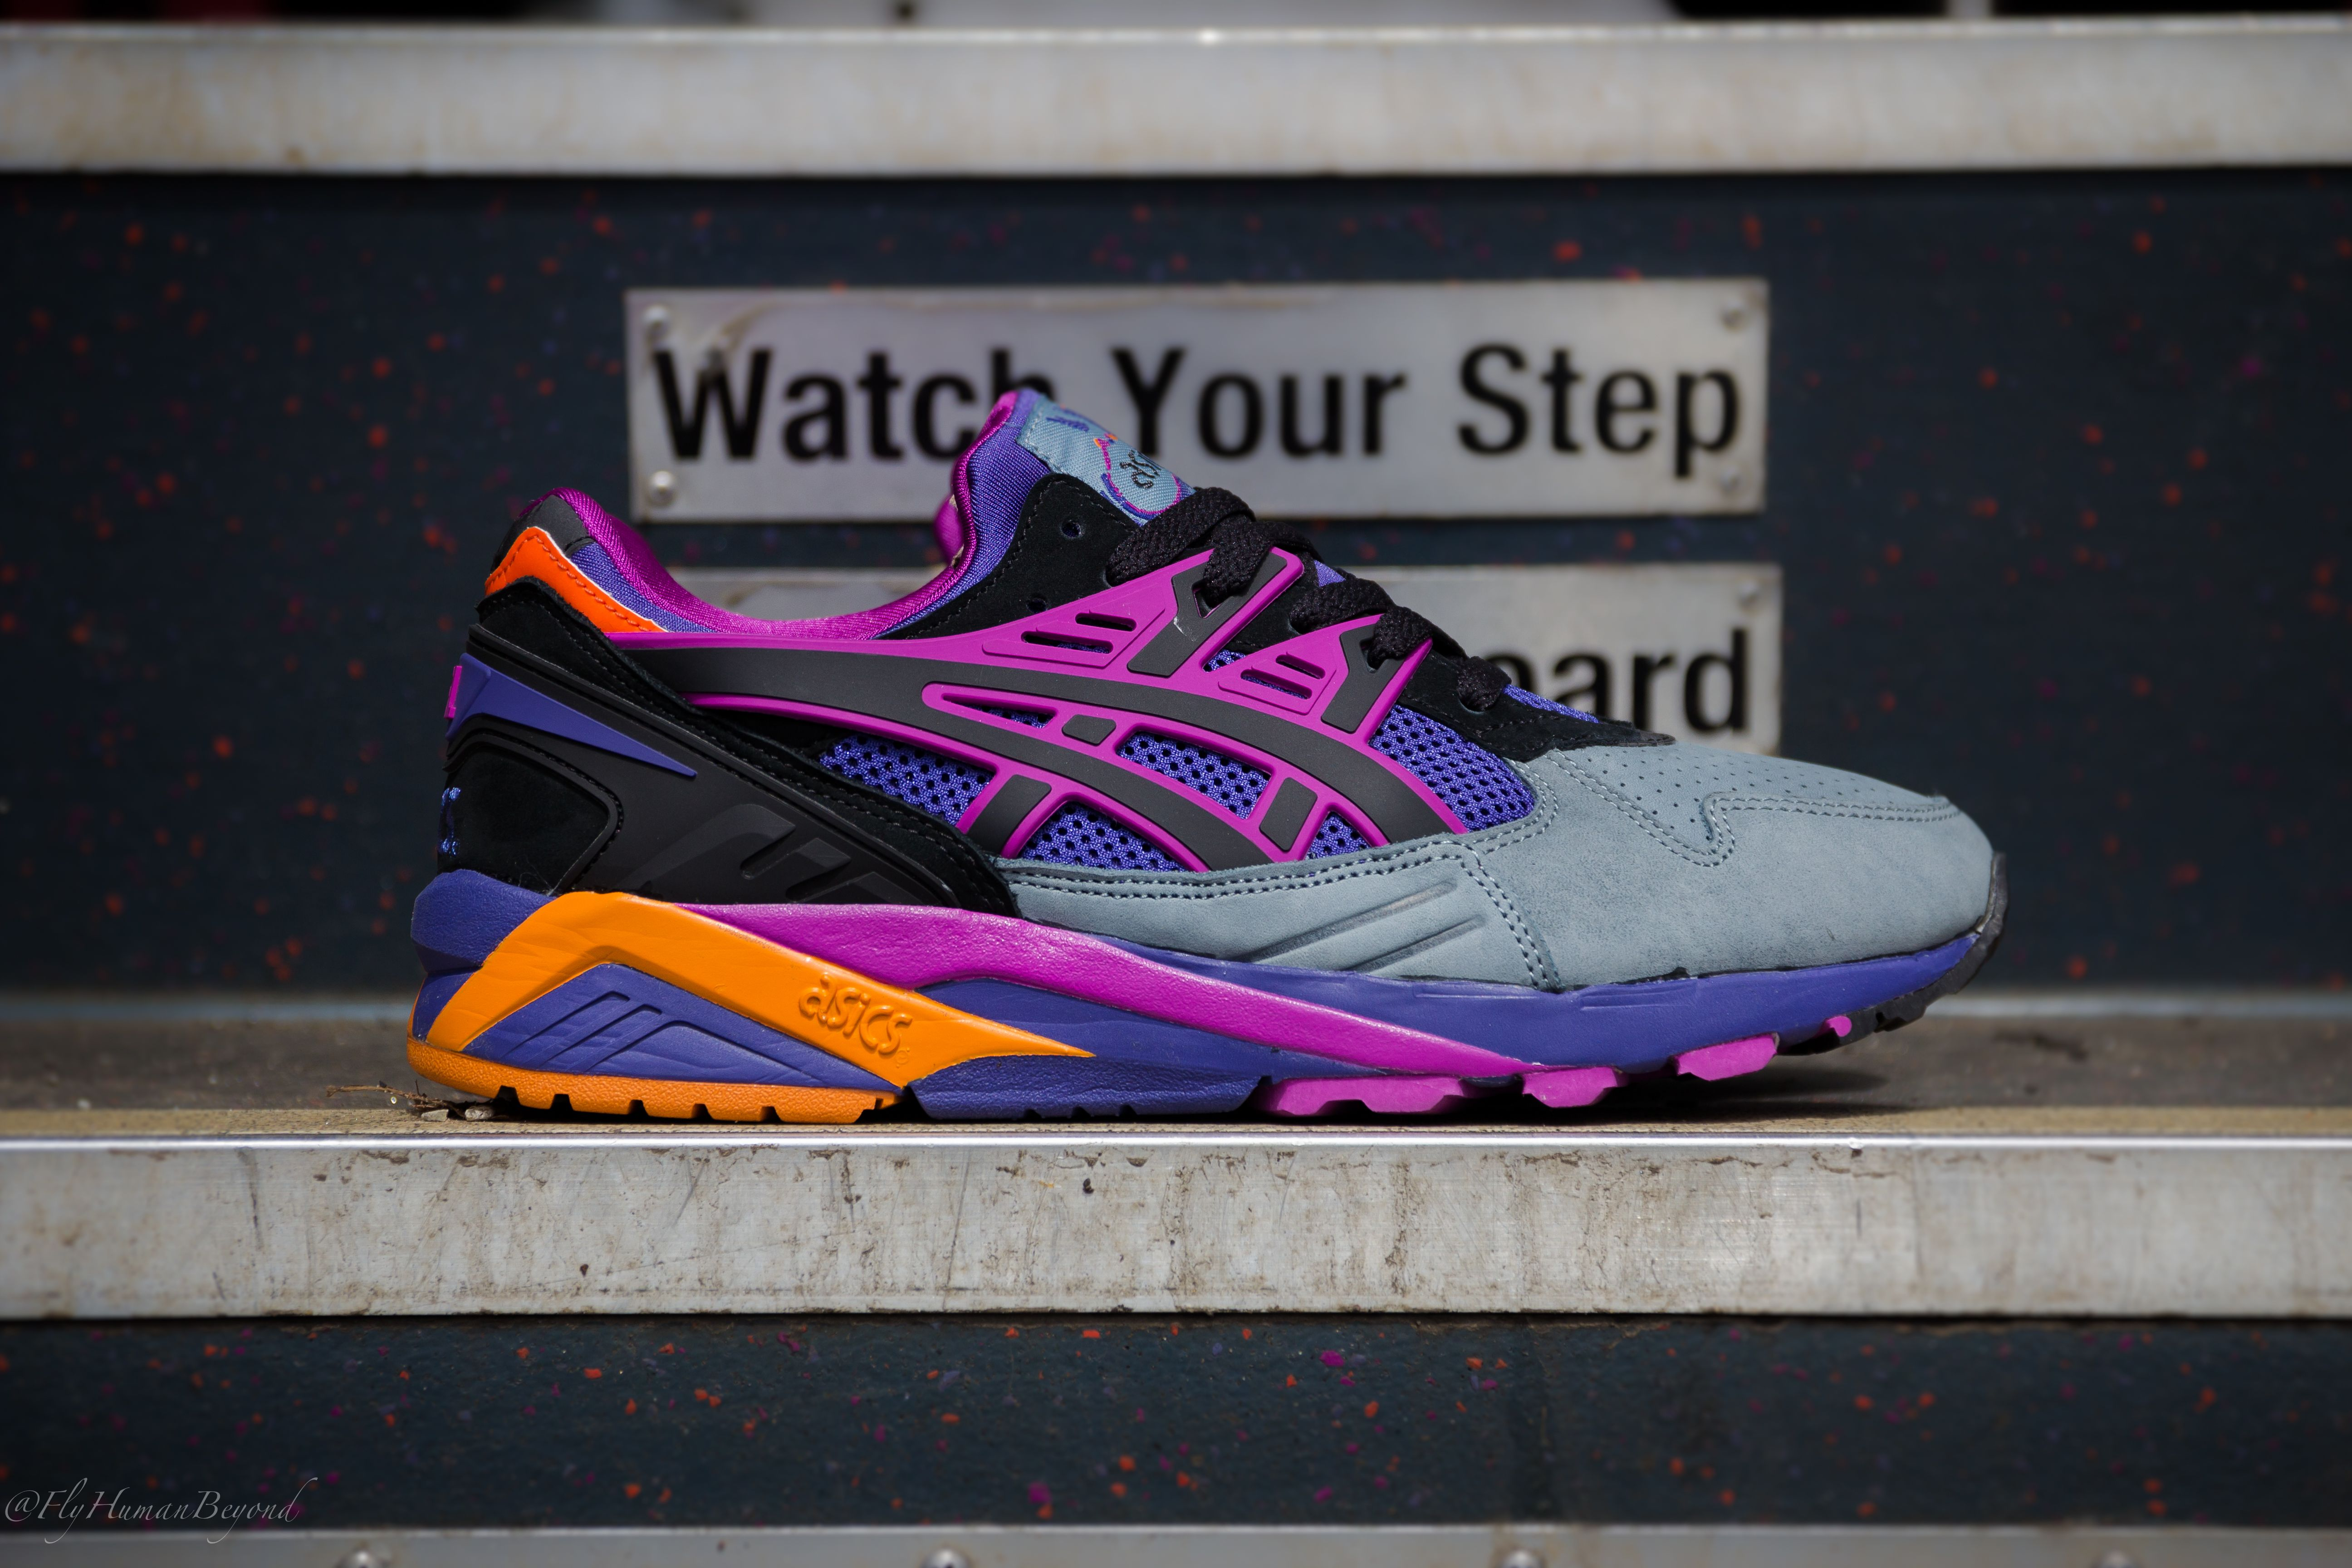 e58946768f Gel Packer Sneakers 2 Shoes t l Asics Vol Trainer r A X Kayano qt6tnrH7